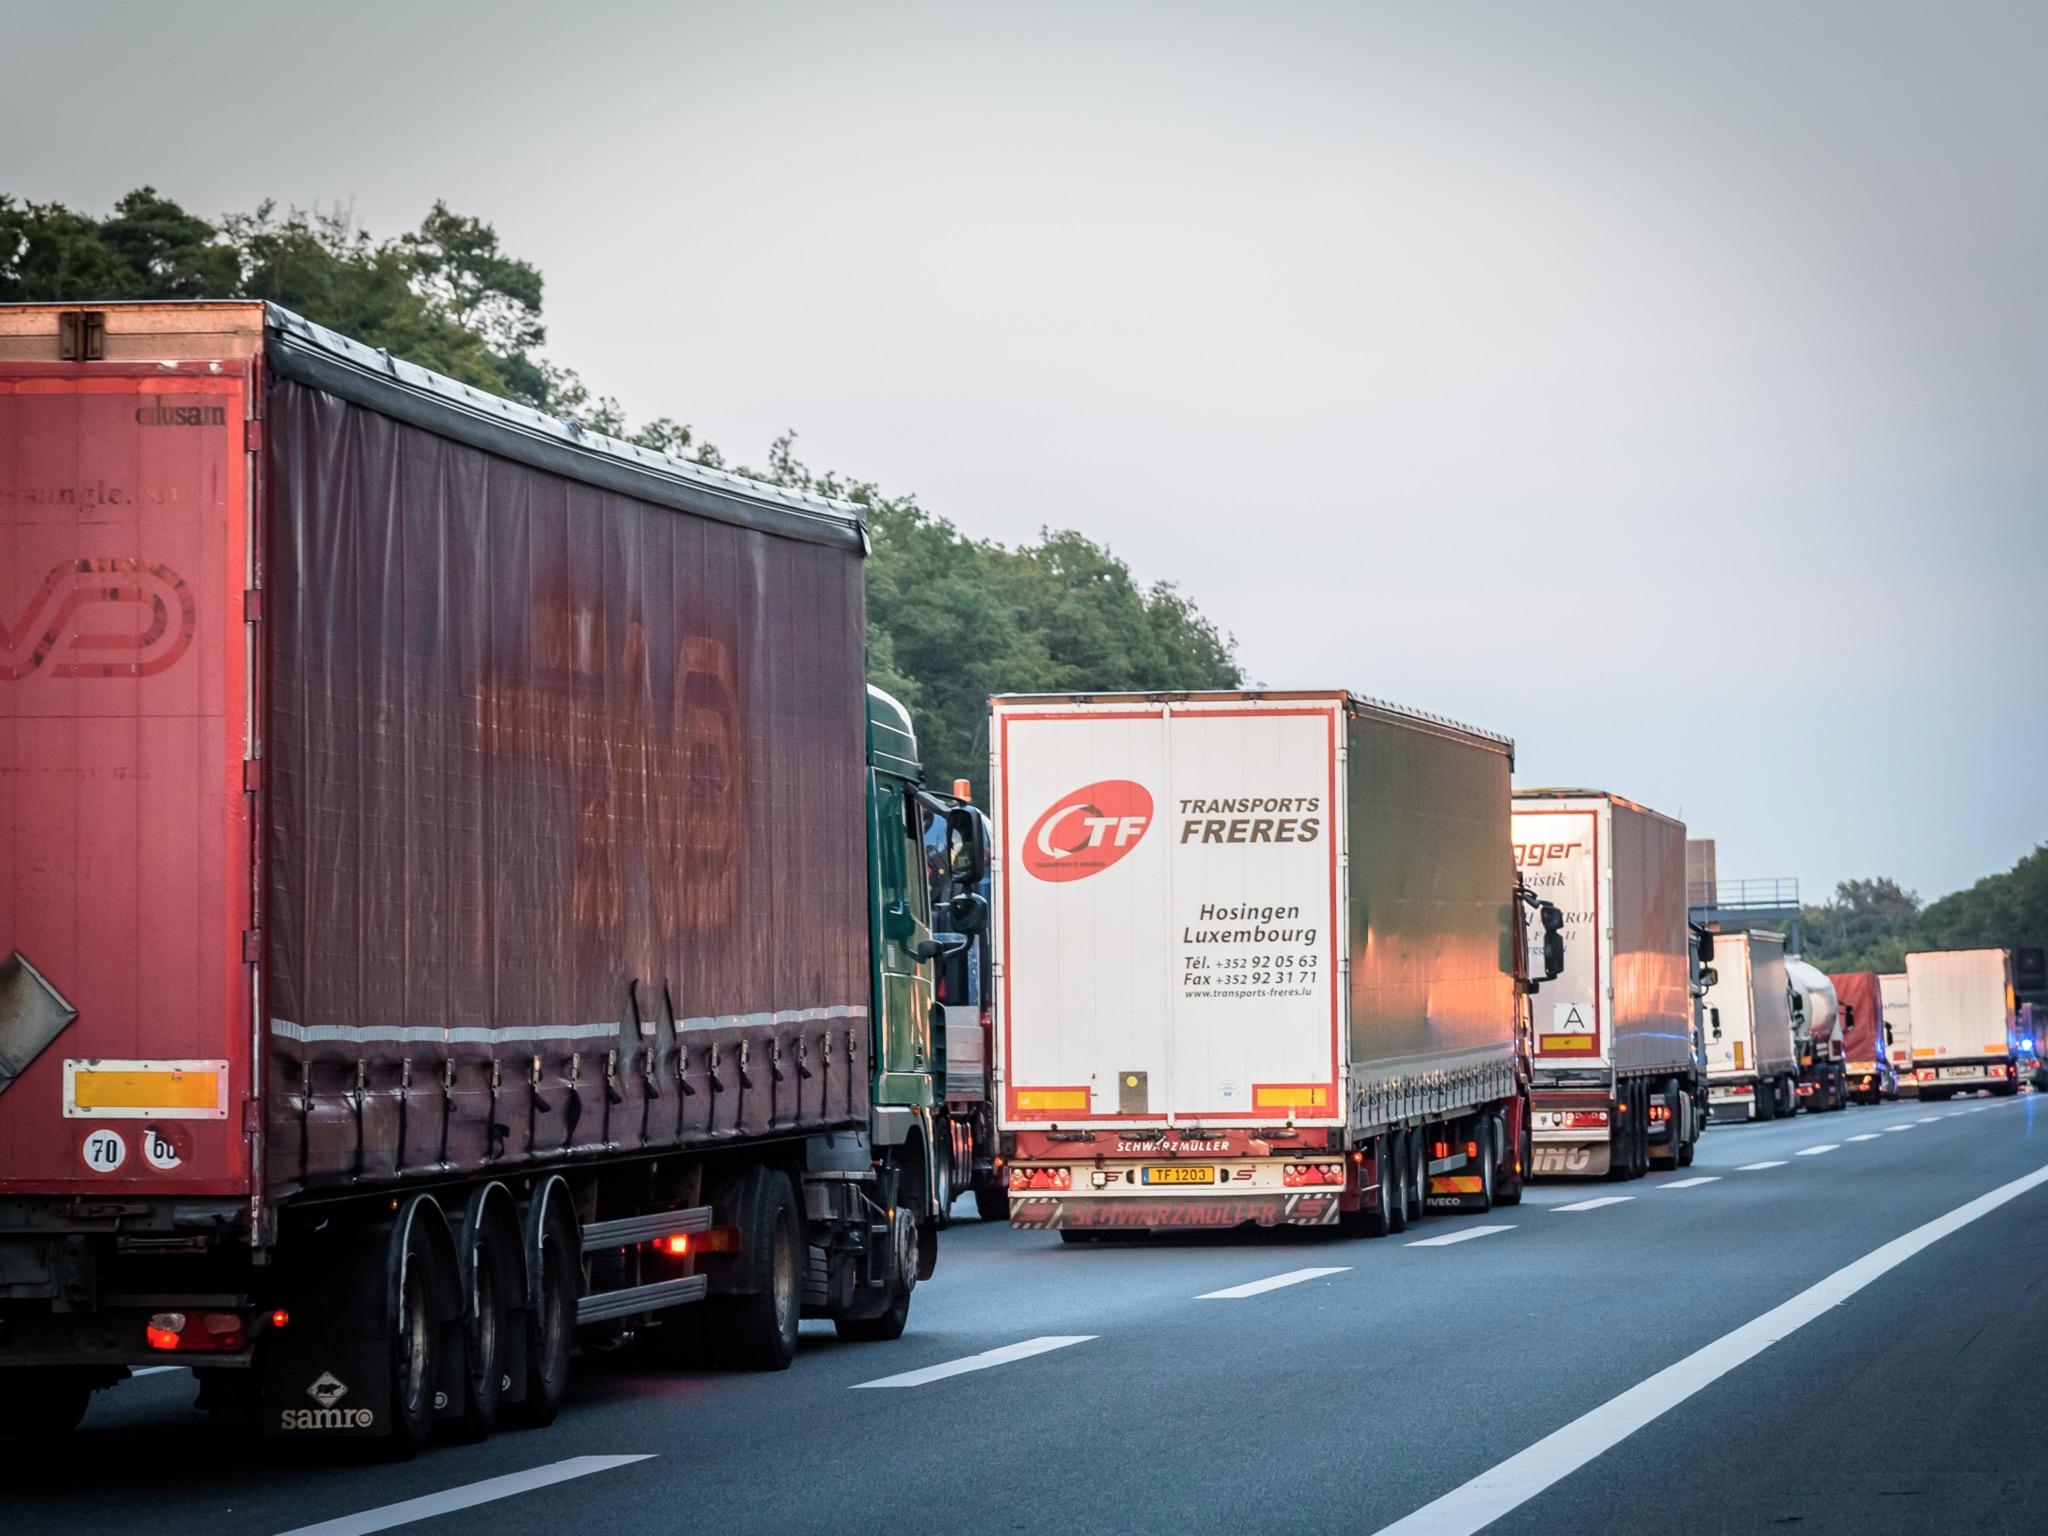 Stau auf der Autobahn. Symbolfoto: Pascal Höfig